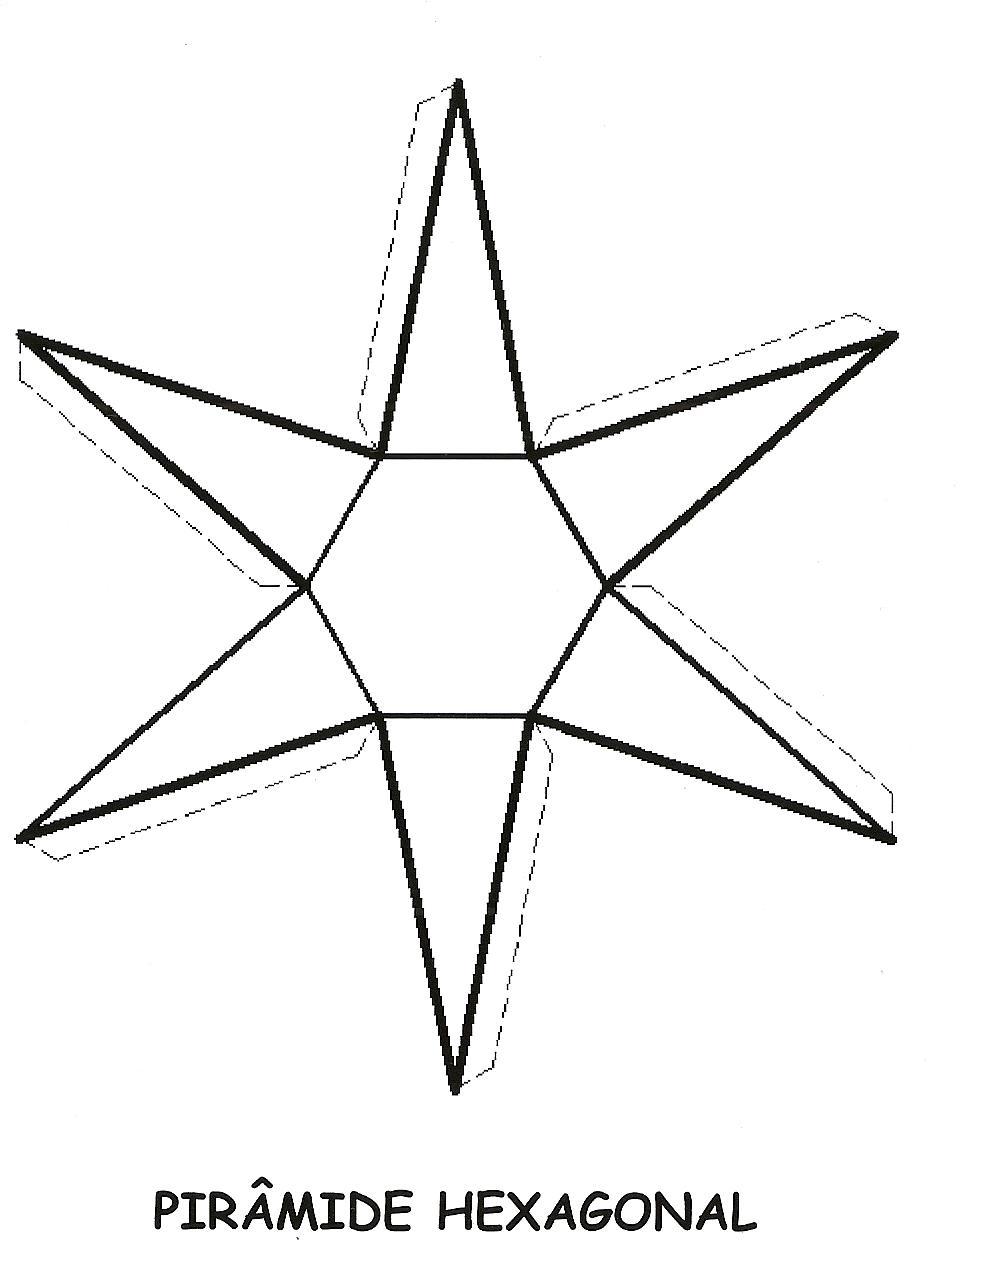 17 Moldes de figuras geométricas para imprimir, recortar e colar ...